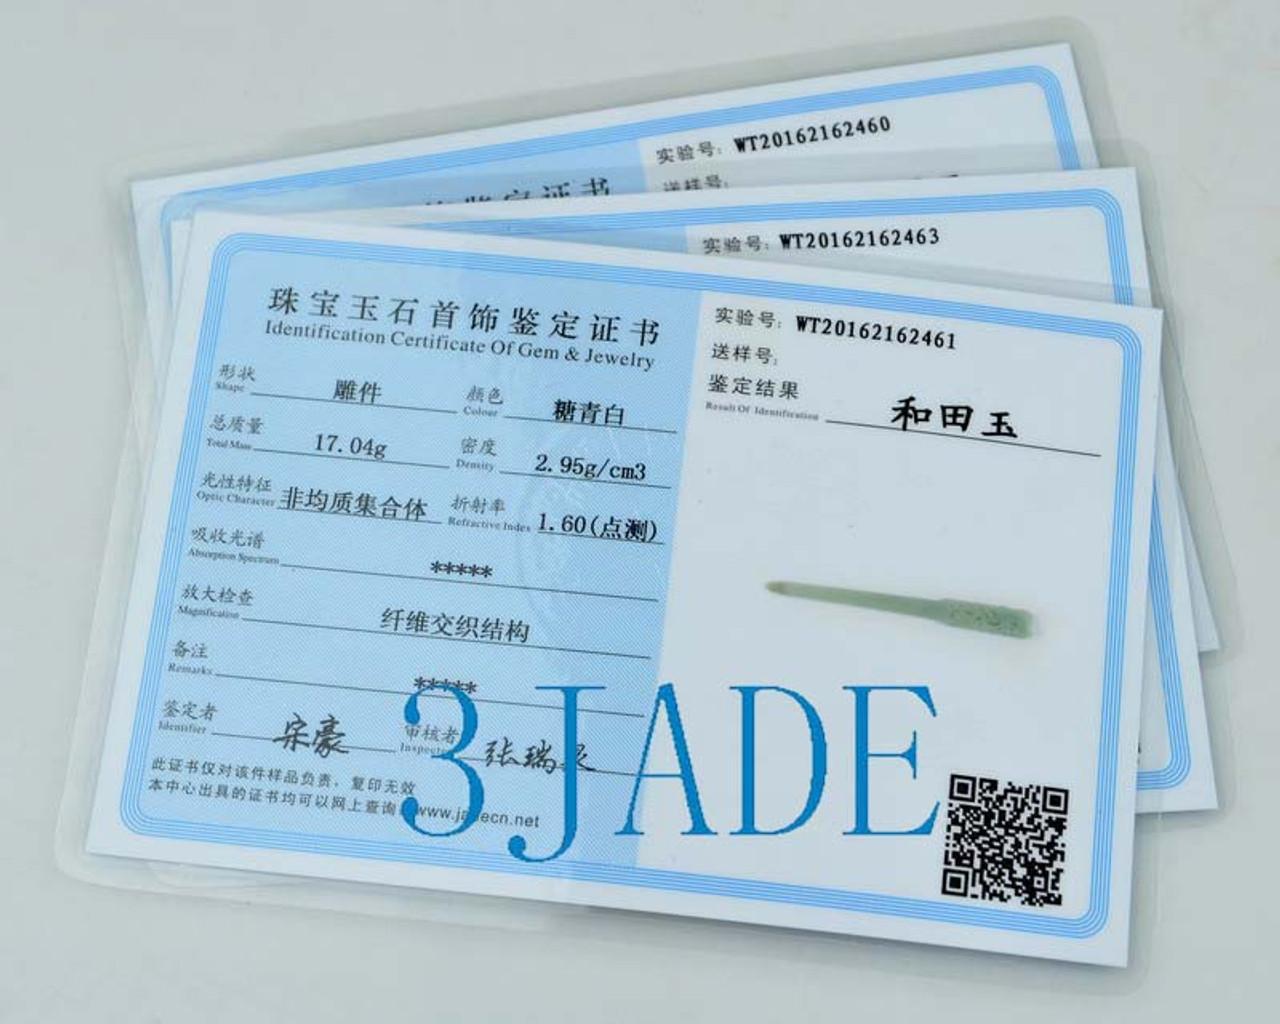 Natural Hetian Nephrite Jade Hair Stick /Hand Carved Hairpin Hair Pin w/ certificate -N012189